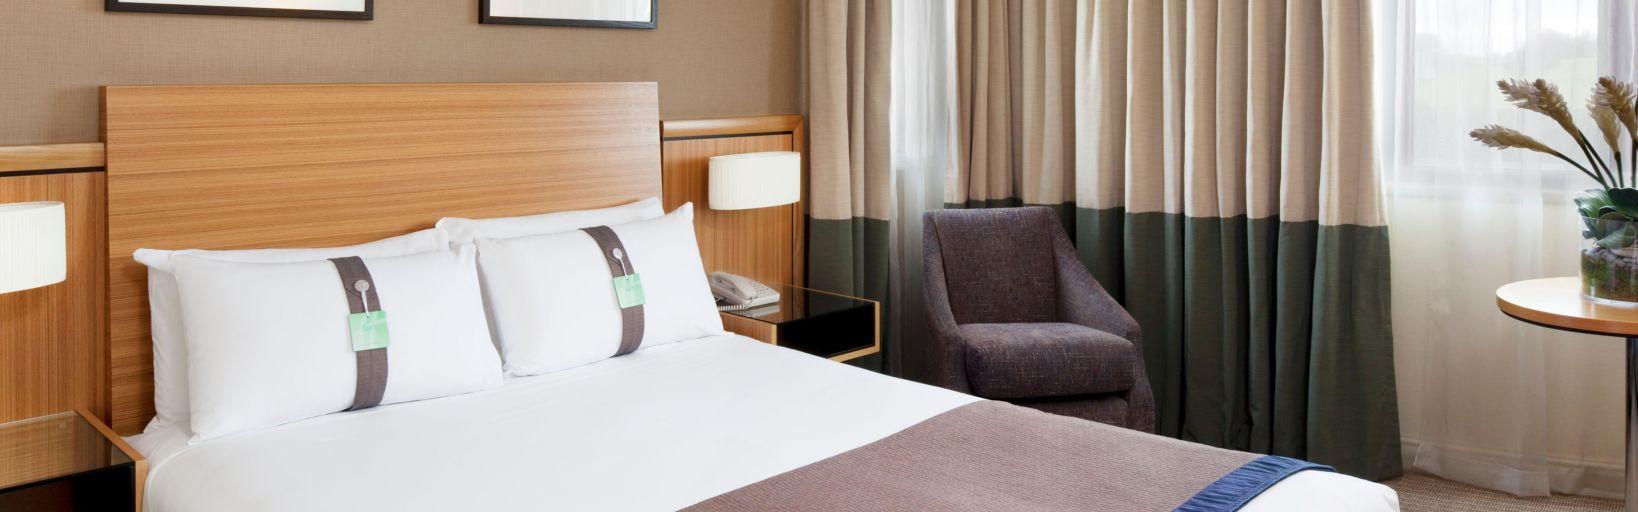 Hotel bei der M5: Holiday Inn Birmingham - Bromsgrove